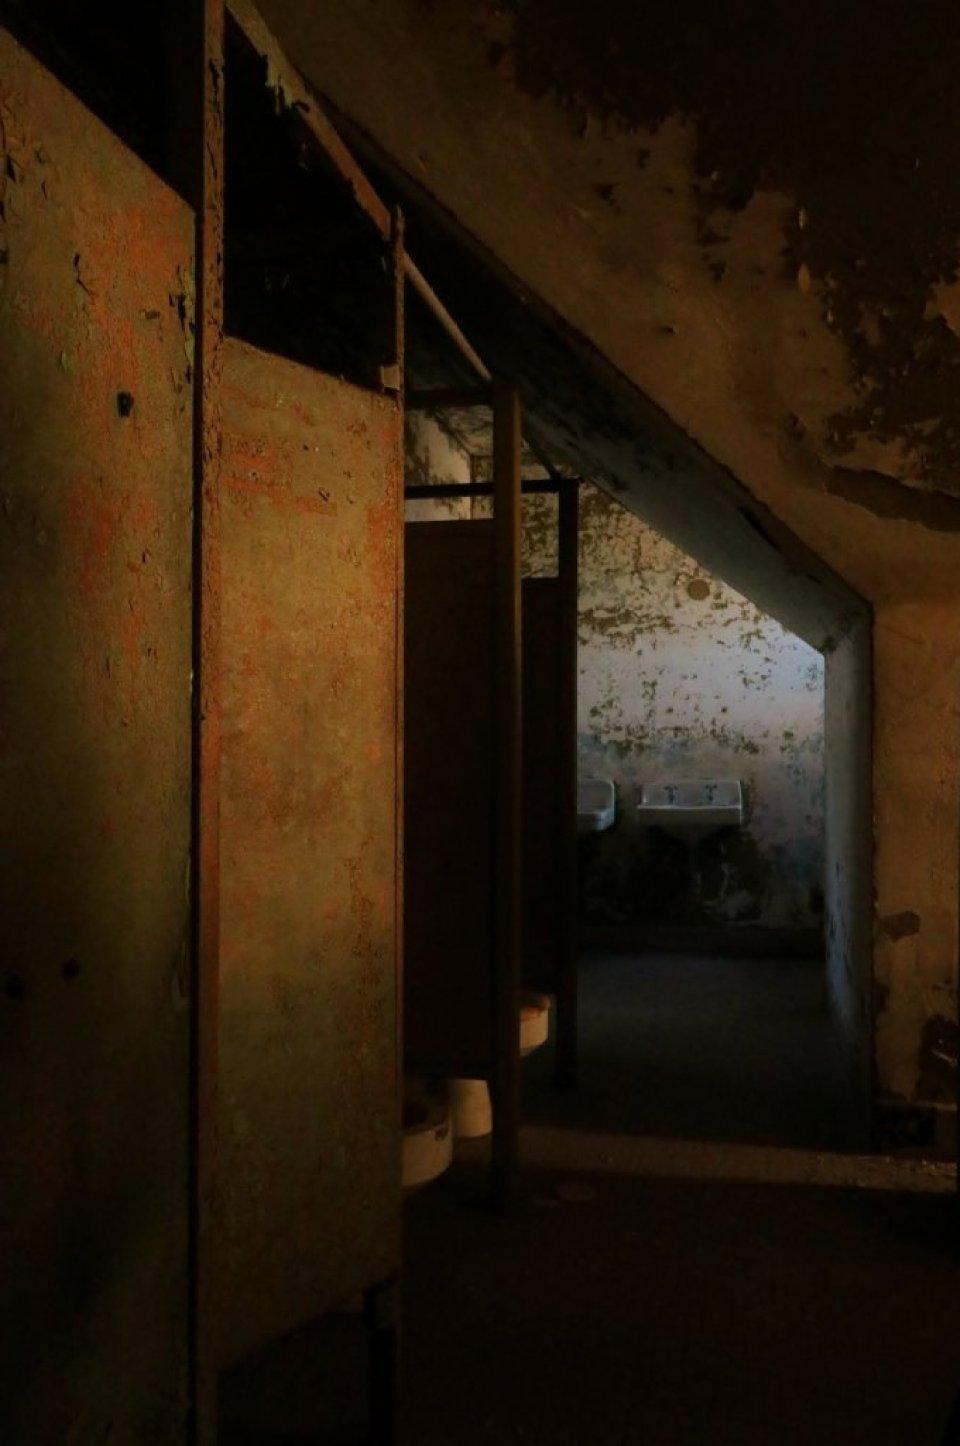 Visiting Pennhurst Asylum - A Photo Diary 8